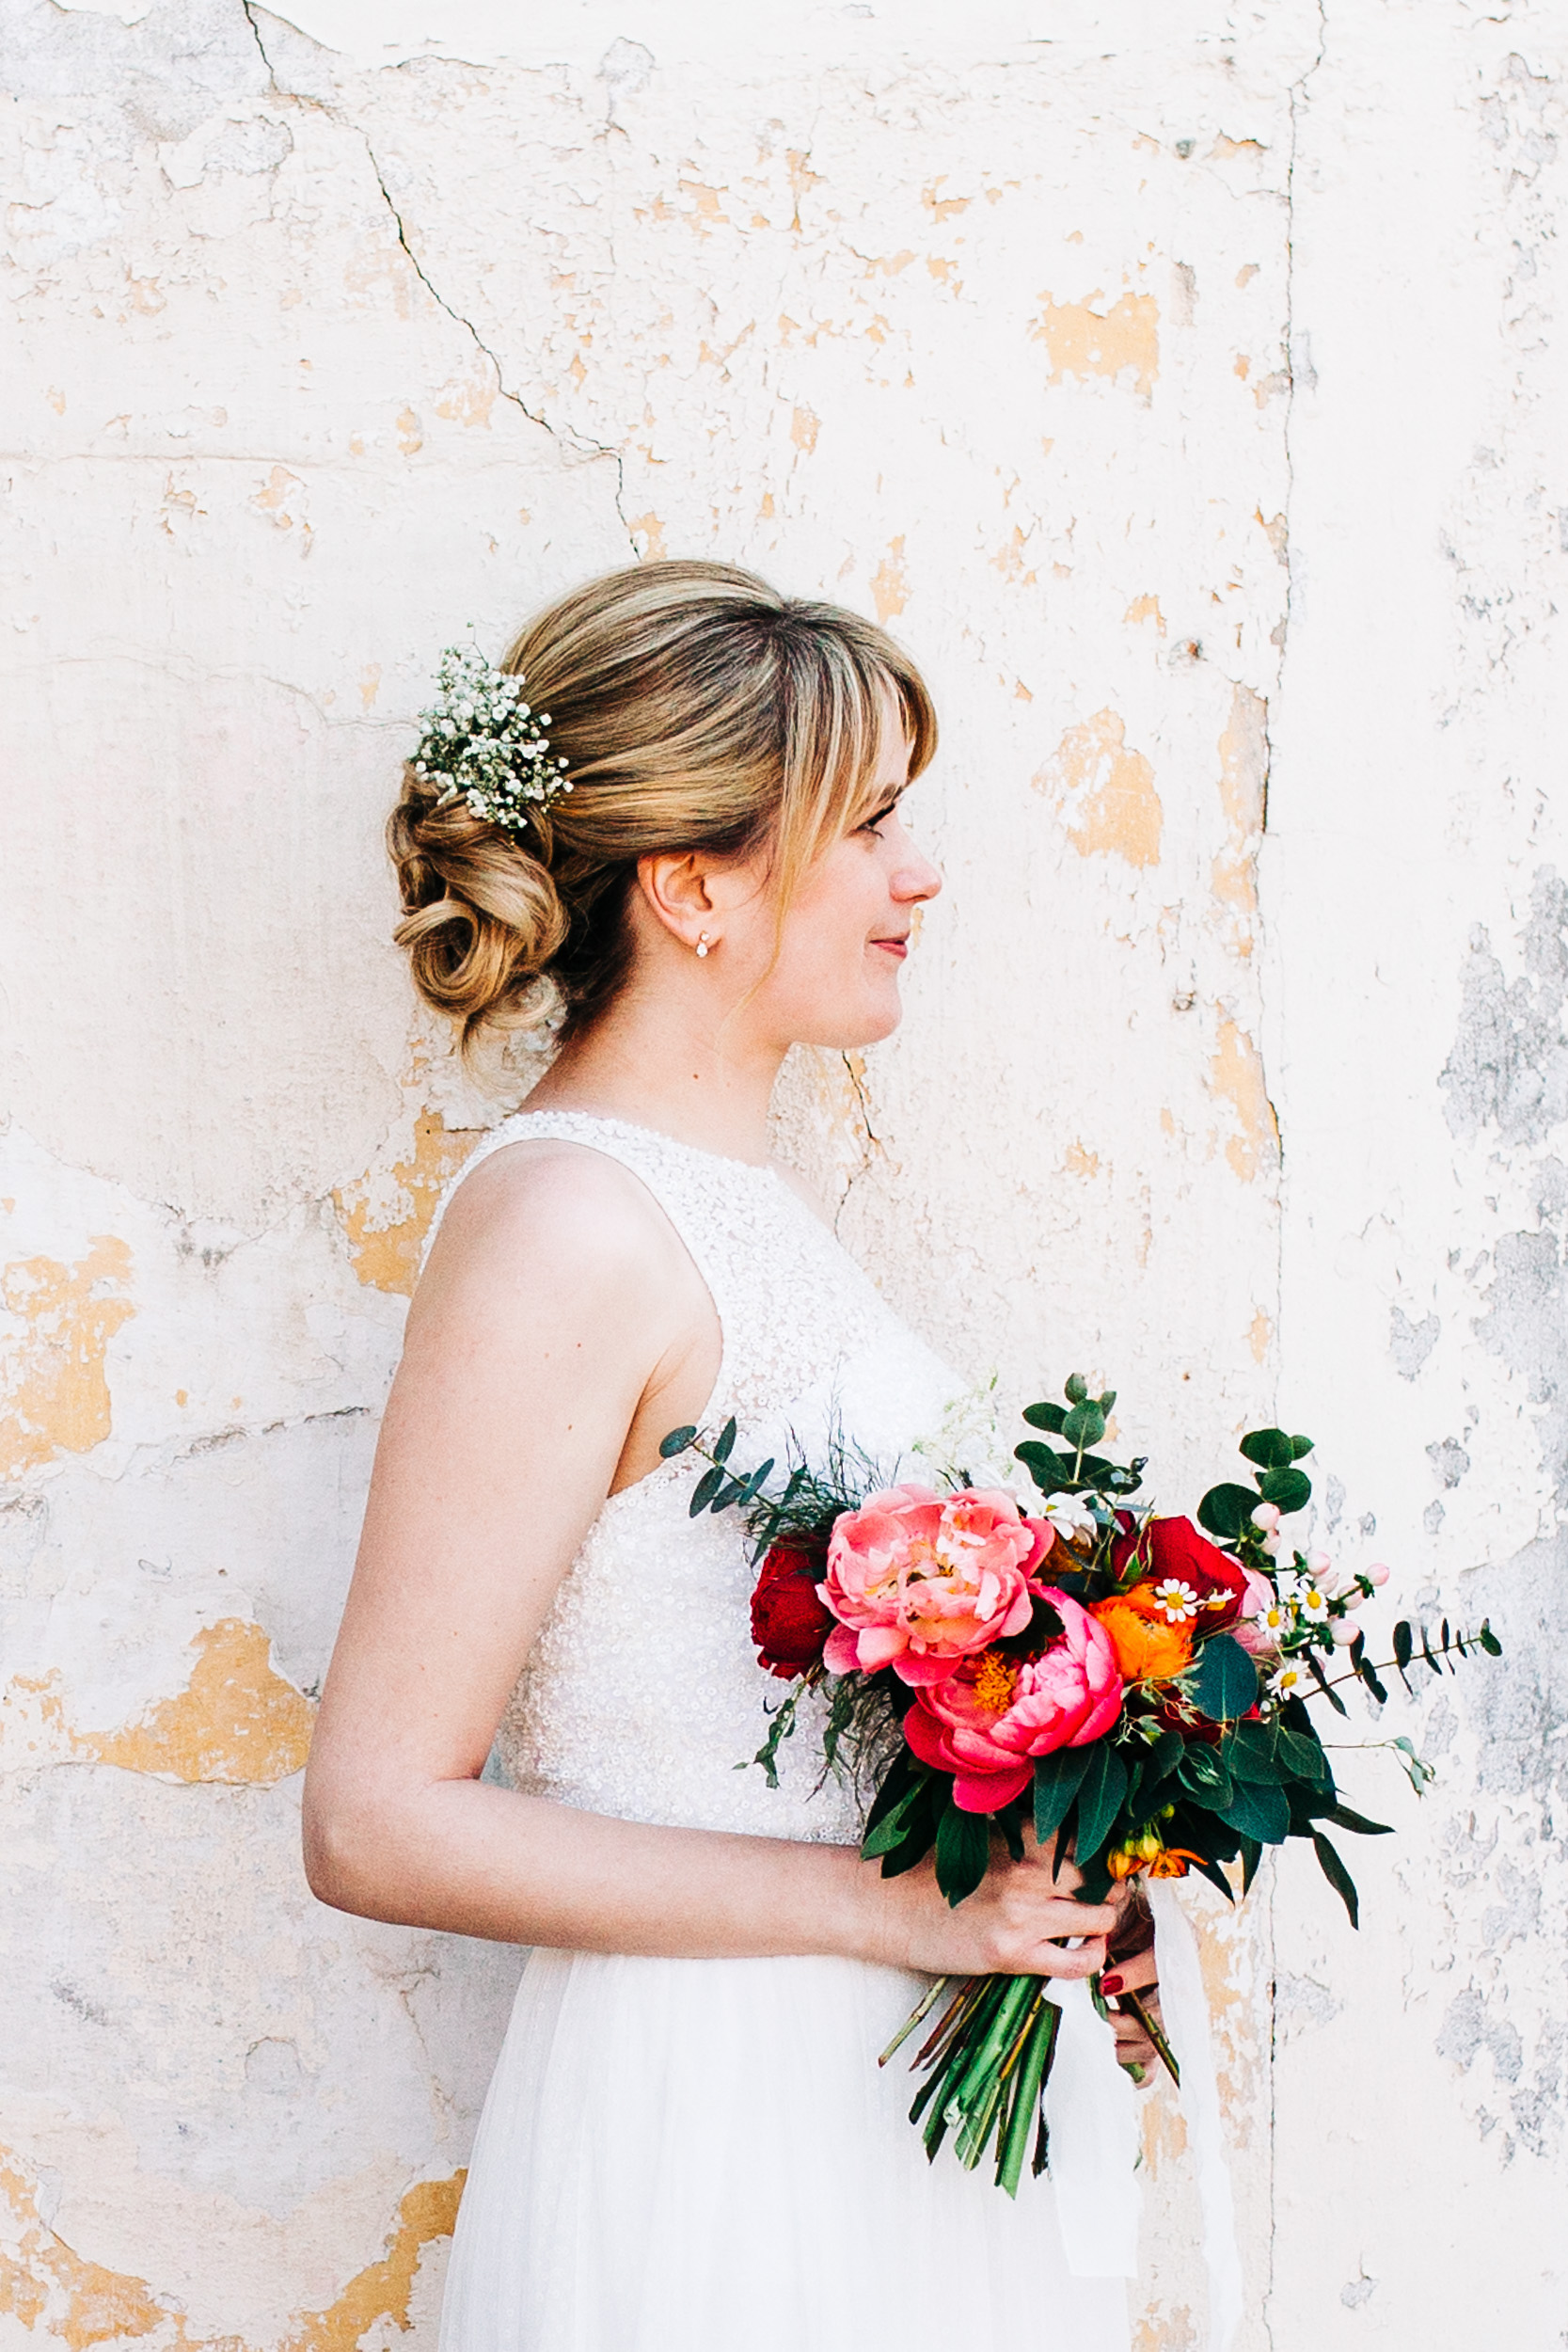 Cardiff Photographer Alex Sedgmond - Photography South Wales - The Printhaus, Cardiff Wedding Photography-16.jpg